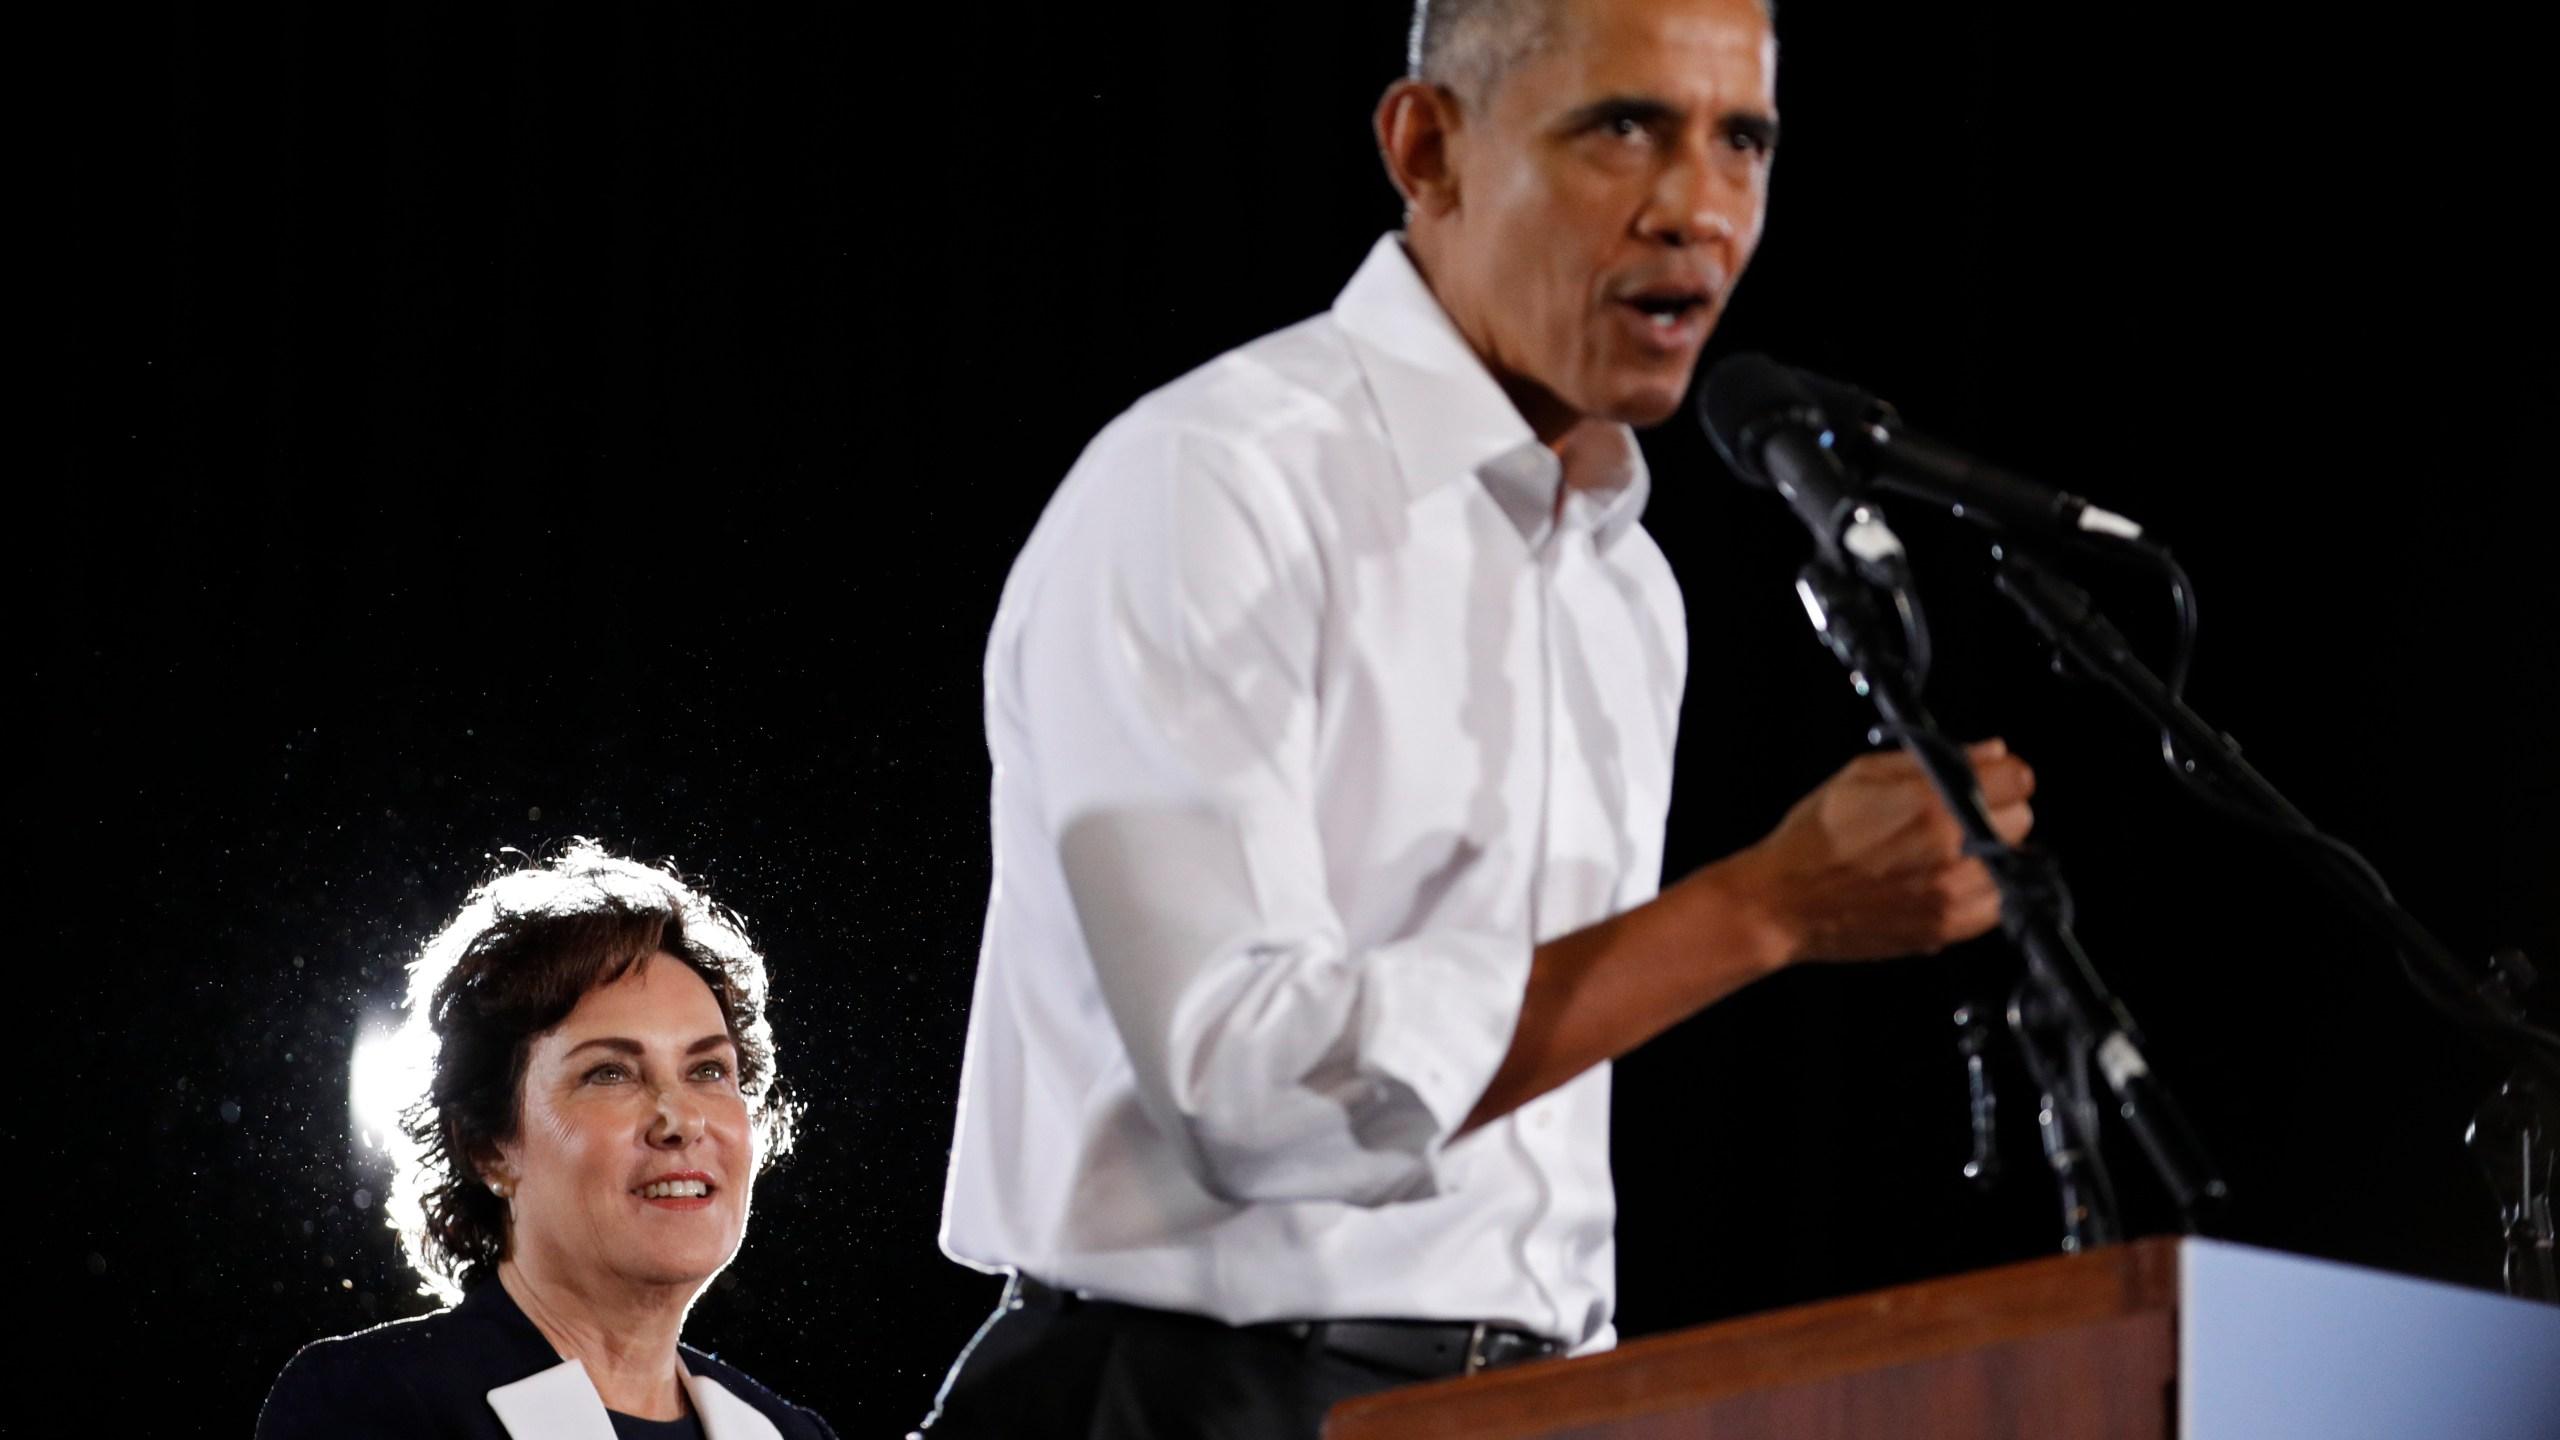 Election_2018_Nevada_Obama_11038-159532.jpg62870926